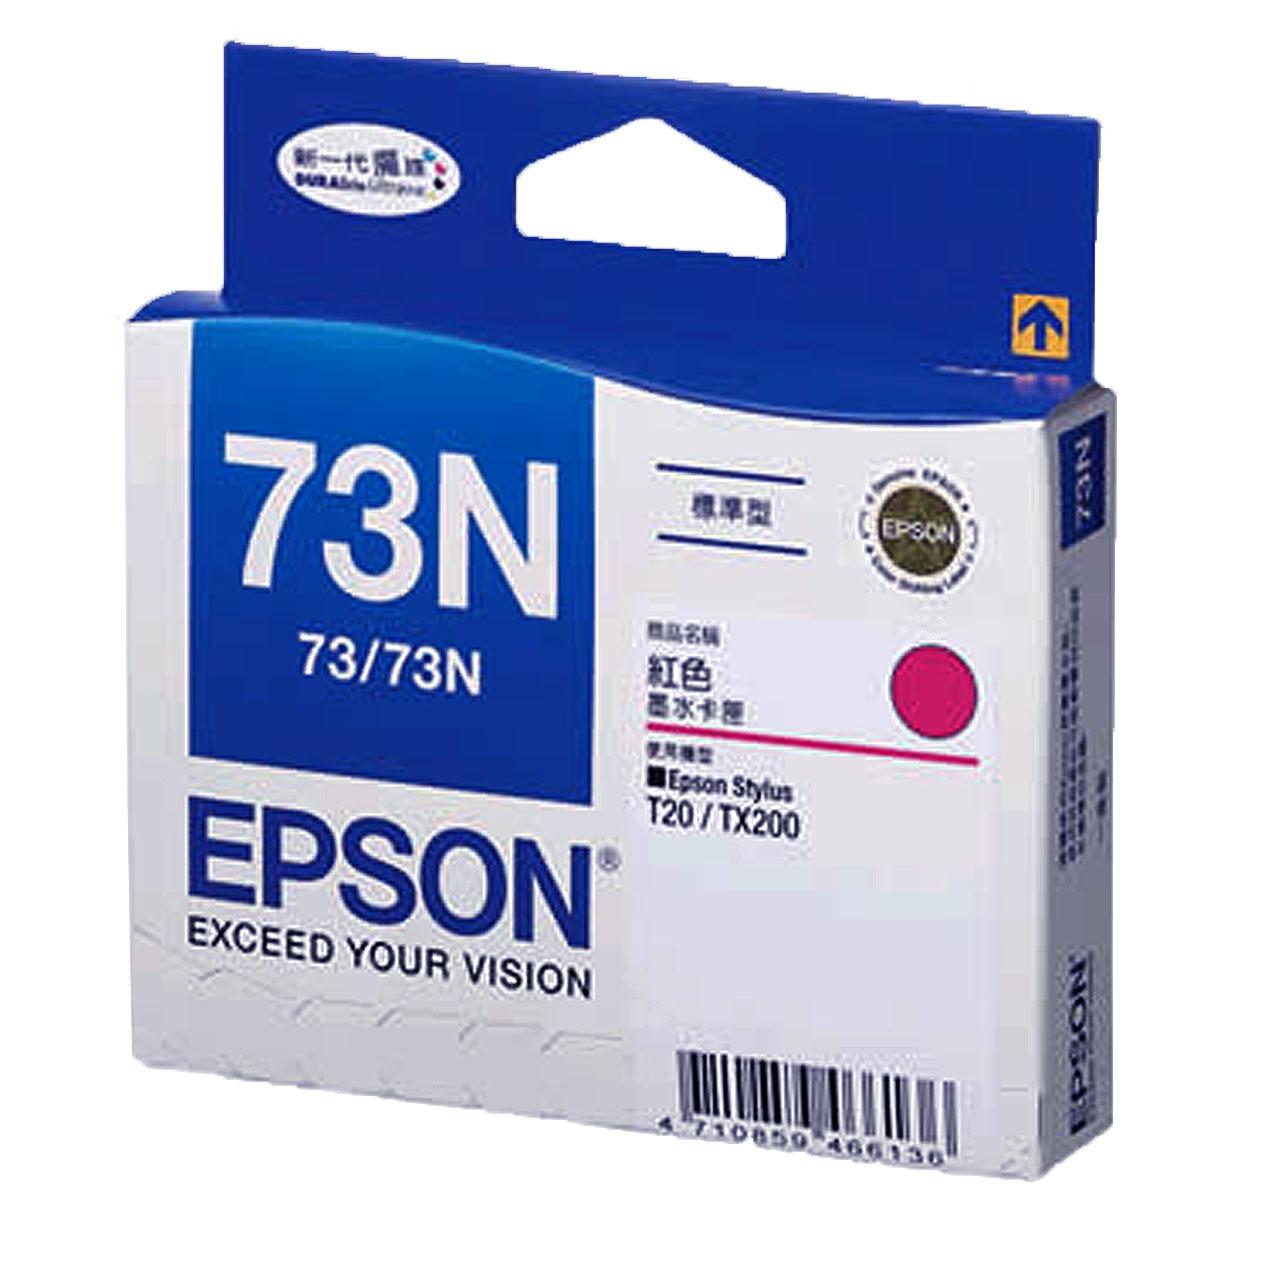 T105350 EPSON 原廠 紅色墨水匣-新一代魔珠墨水 適用 C79/C90/C110/CX3900/CX4900/CX5500/CX5505/CX5900/CX6900F/CX7300